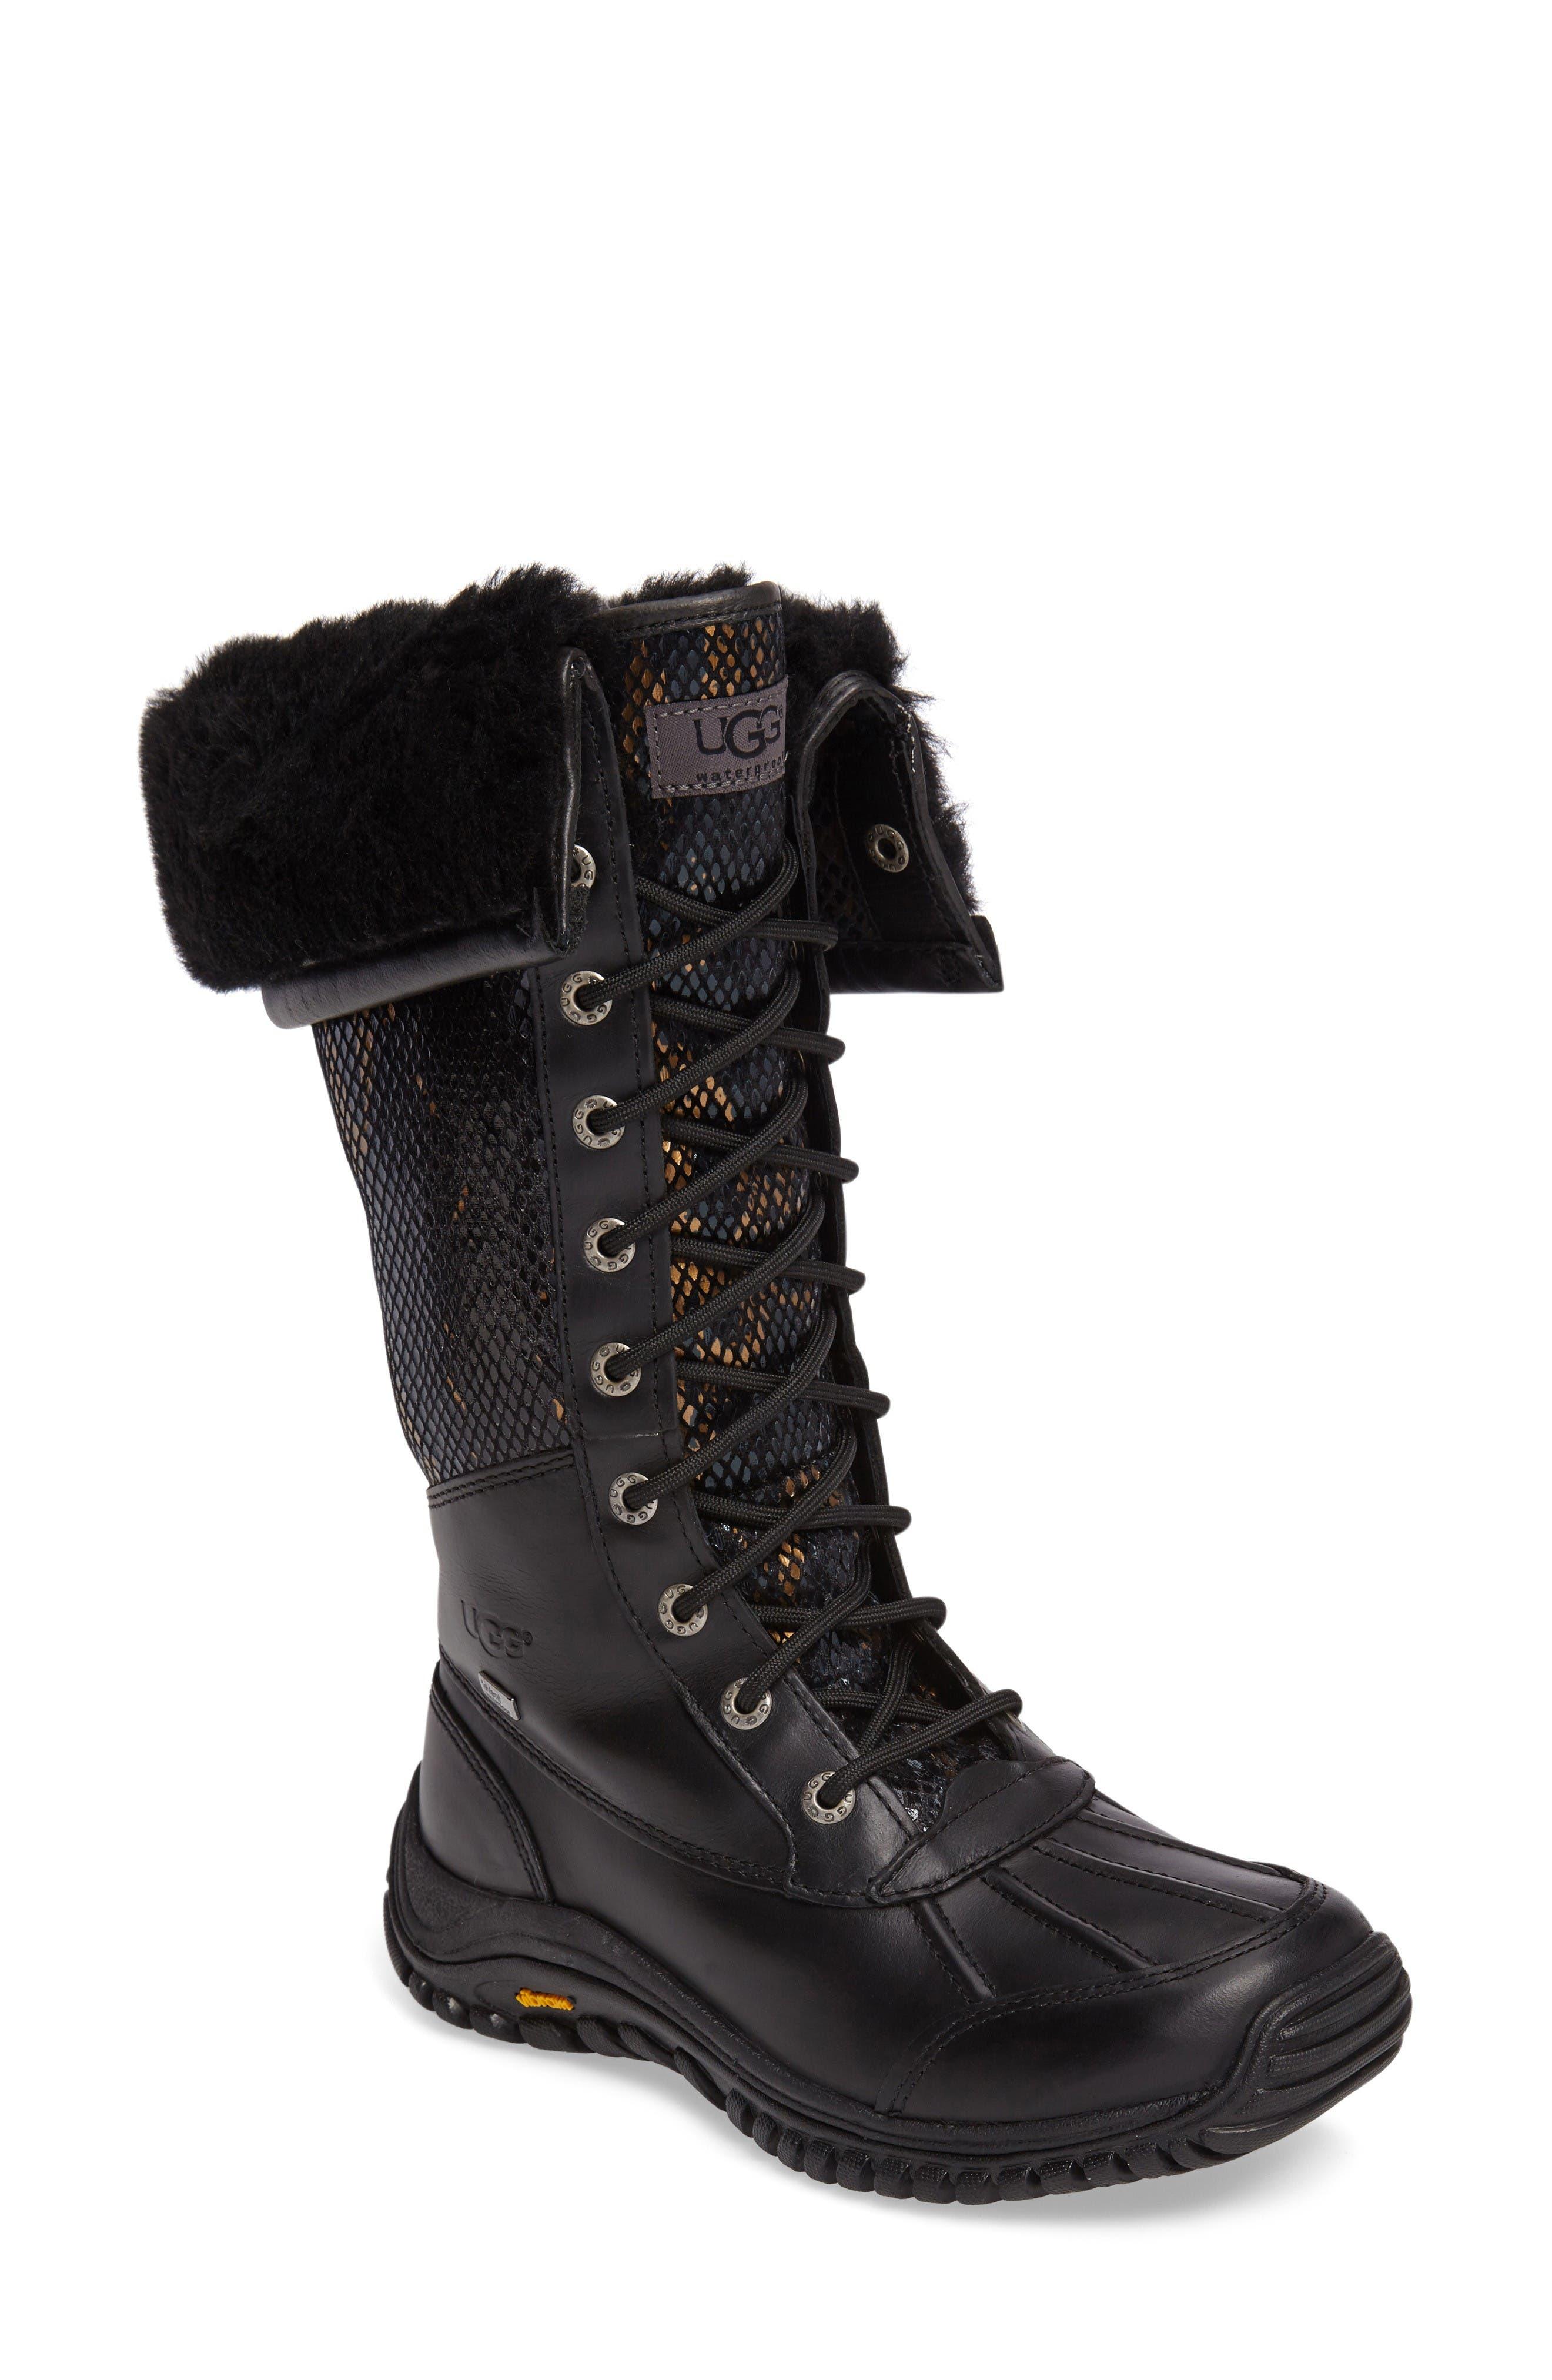 Alternate Image 1 Selected - UGG® Adirondack Tall Exotic Velvet Waterproof Winter Boot (Women)